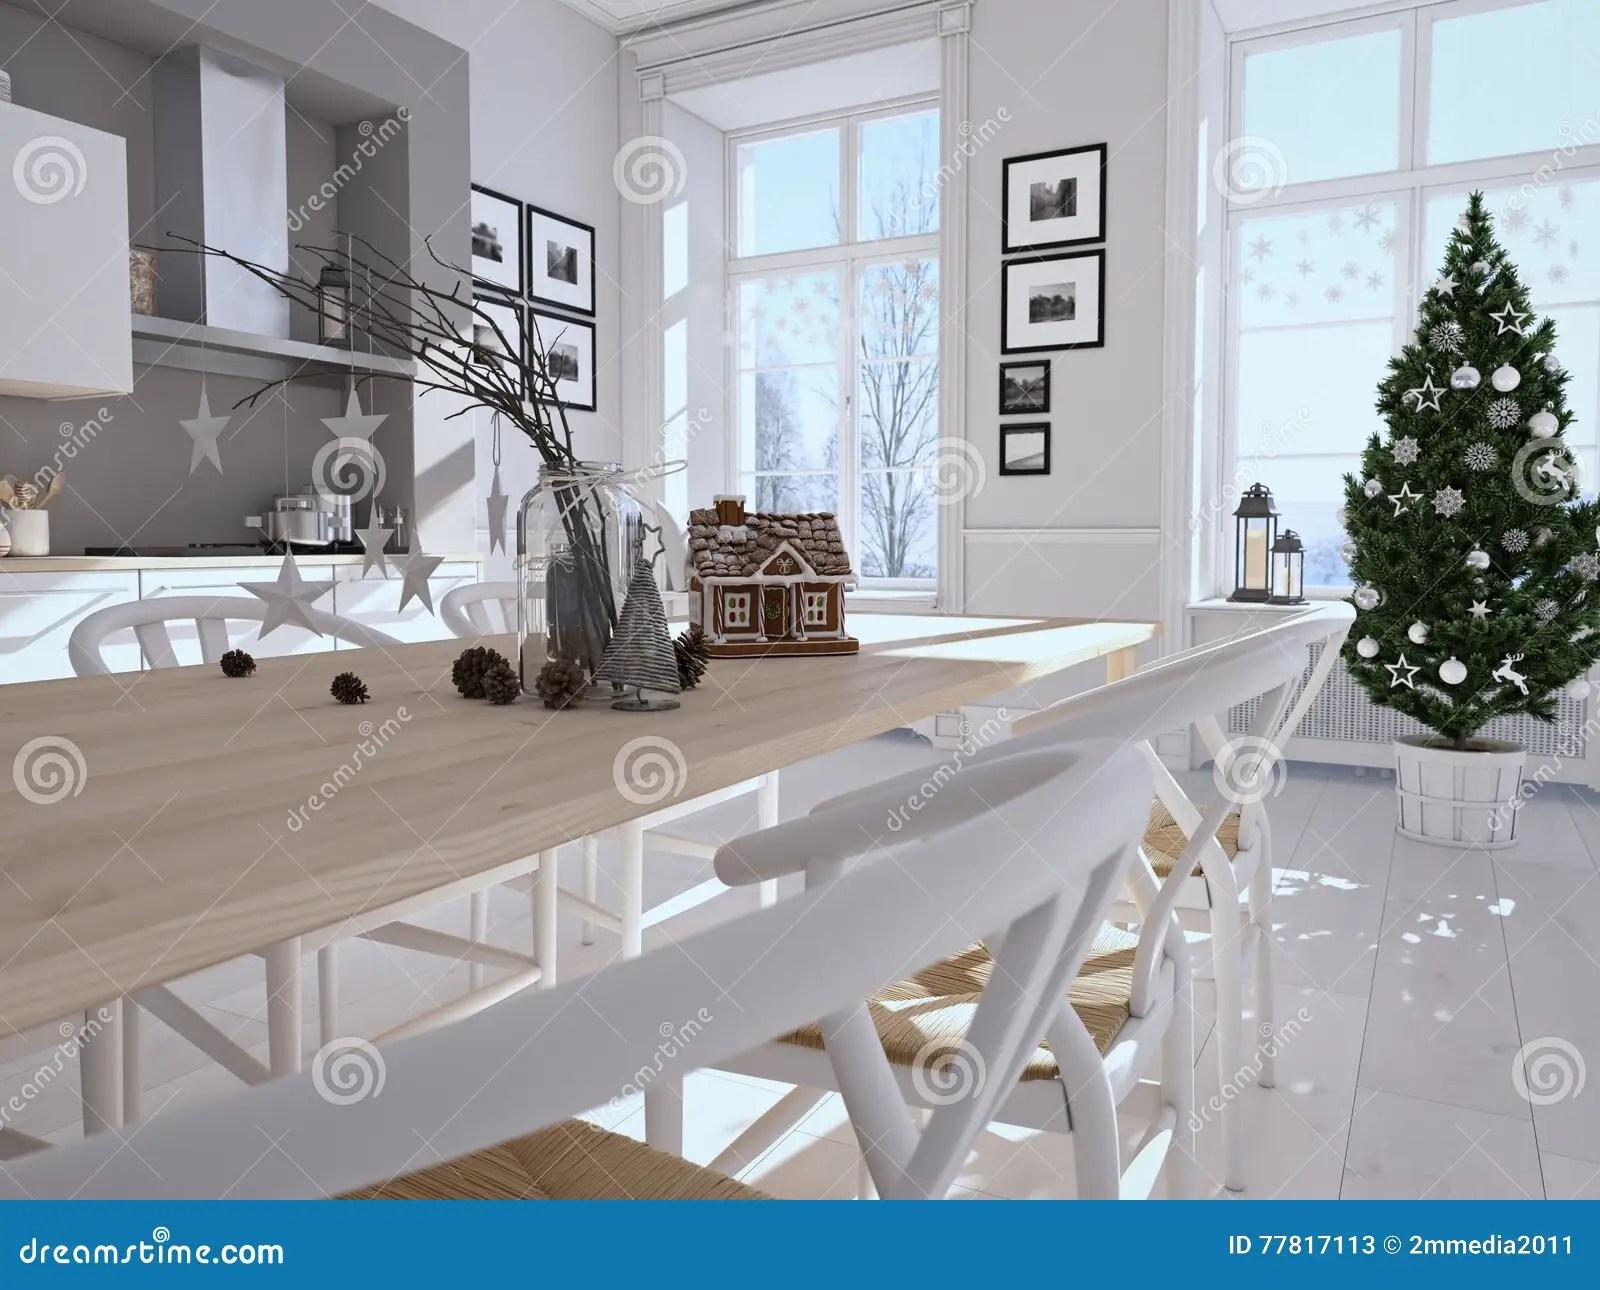 kitchen lanterns cabinets san diego 有圣诞节装饰的北欧厨房3d翻译库存图片 图片包括有设计 灯笼 魔术 3d翻译有圣诞节装饰的北欧厨房